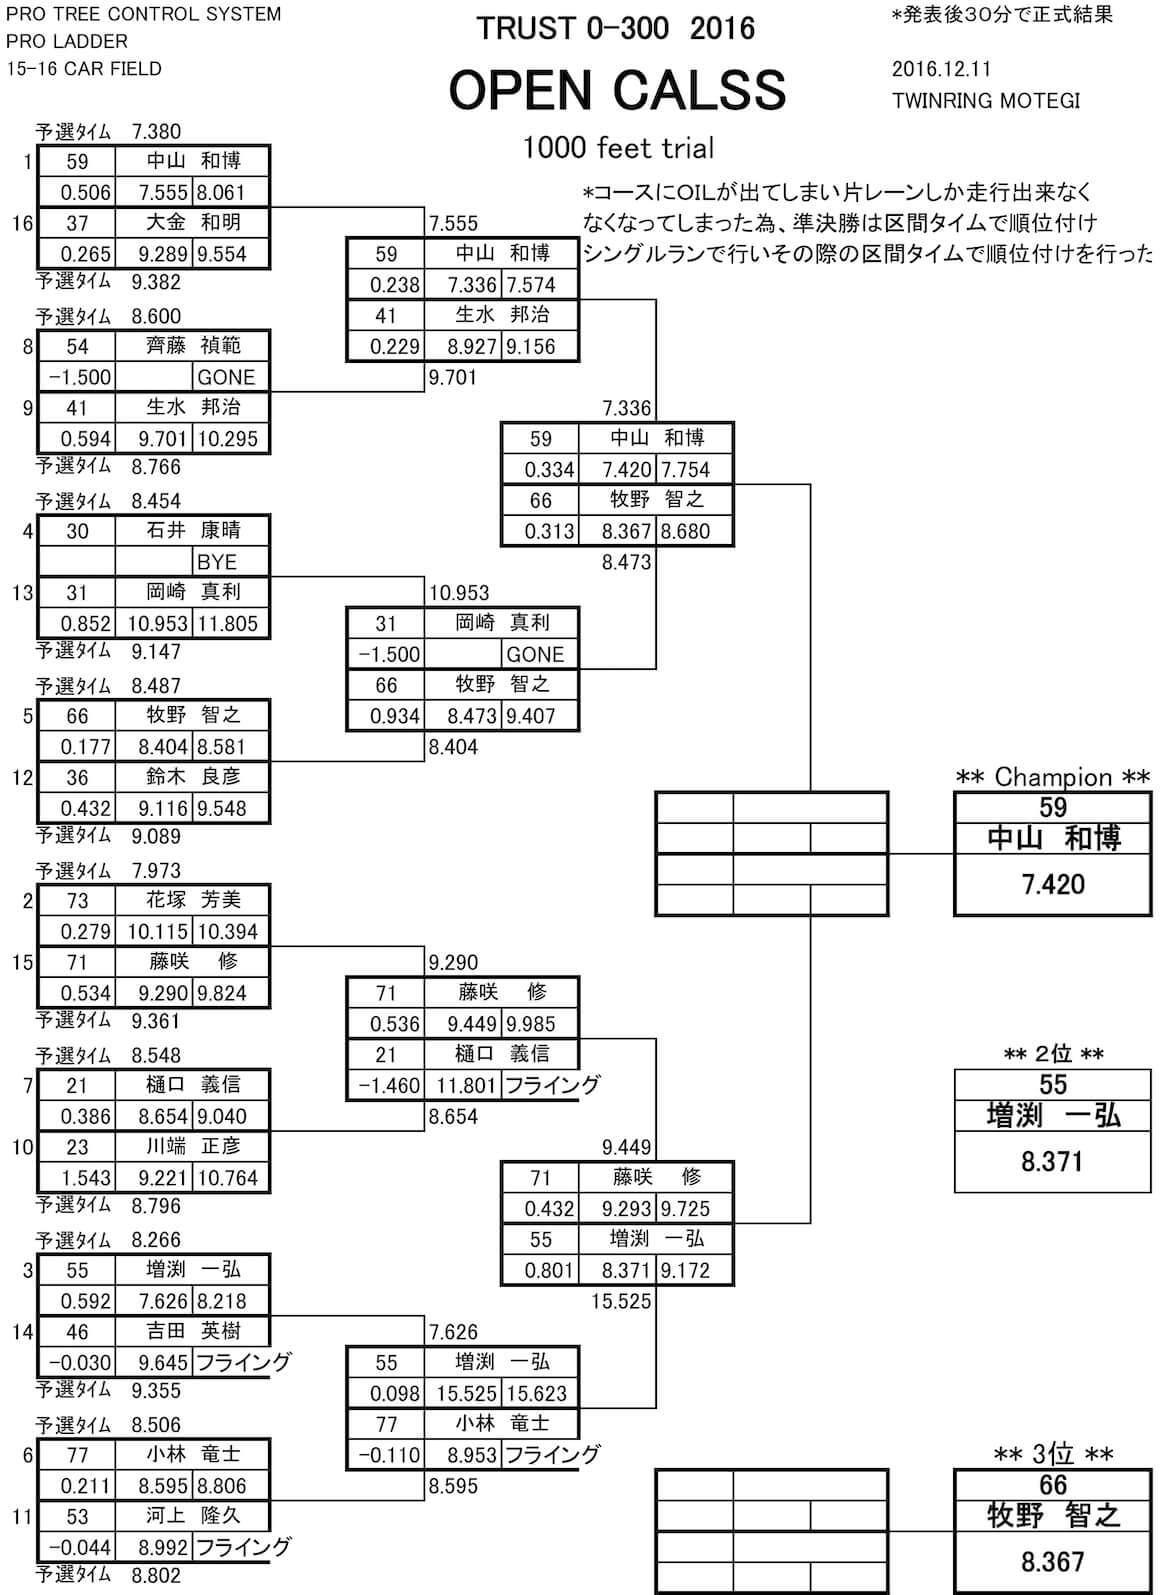 trust_0-300_tournament.jpg